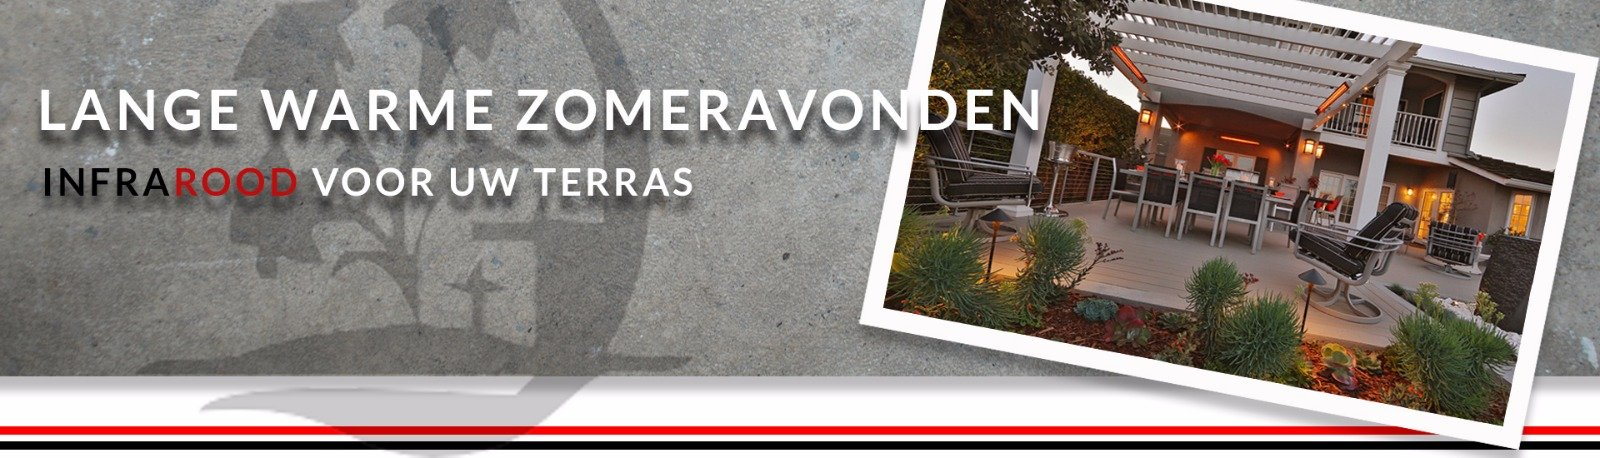 Infrarood terrasverwarming | prijs terrasverwarming